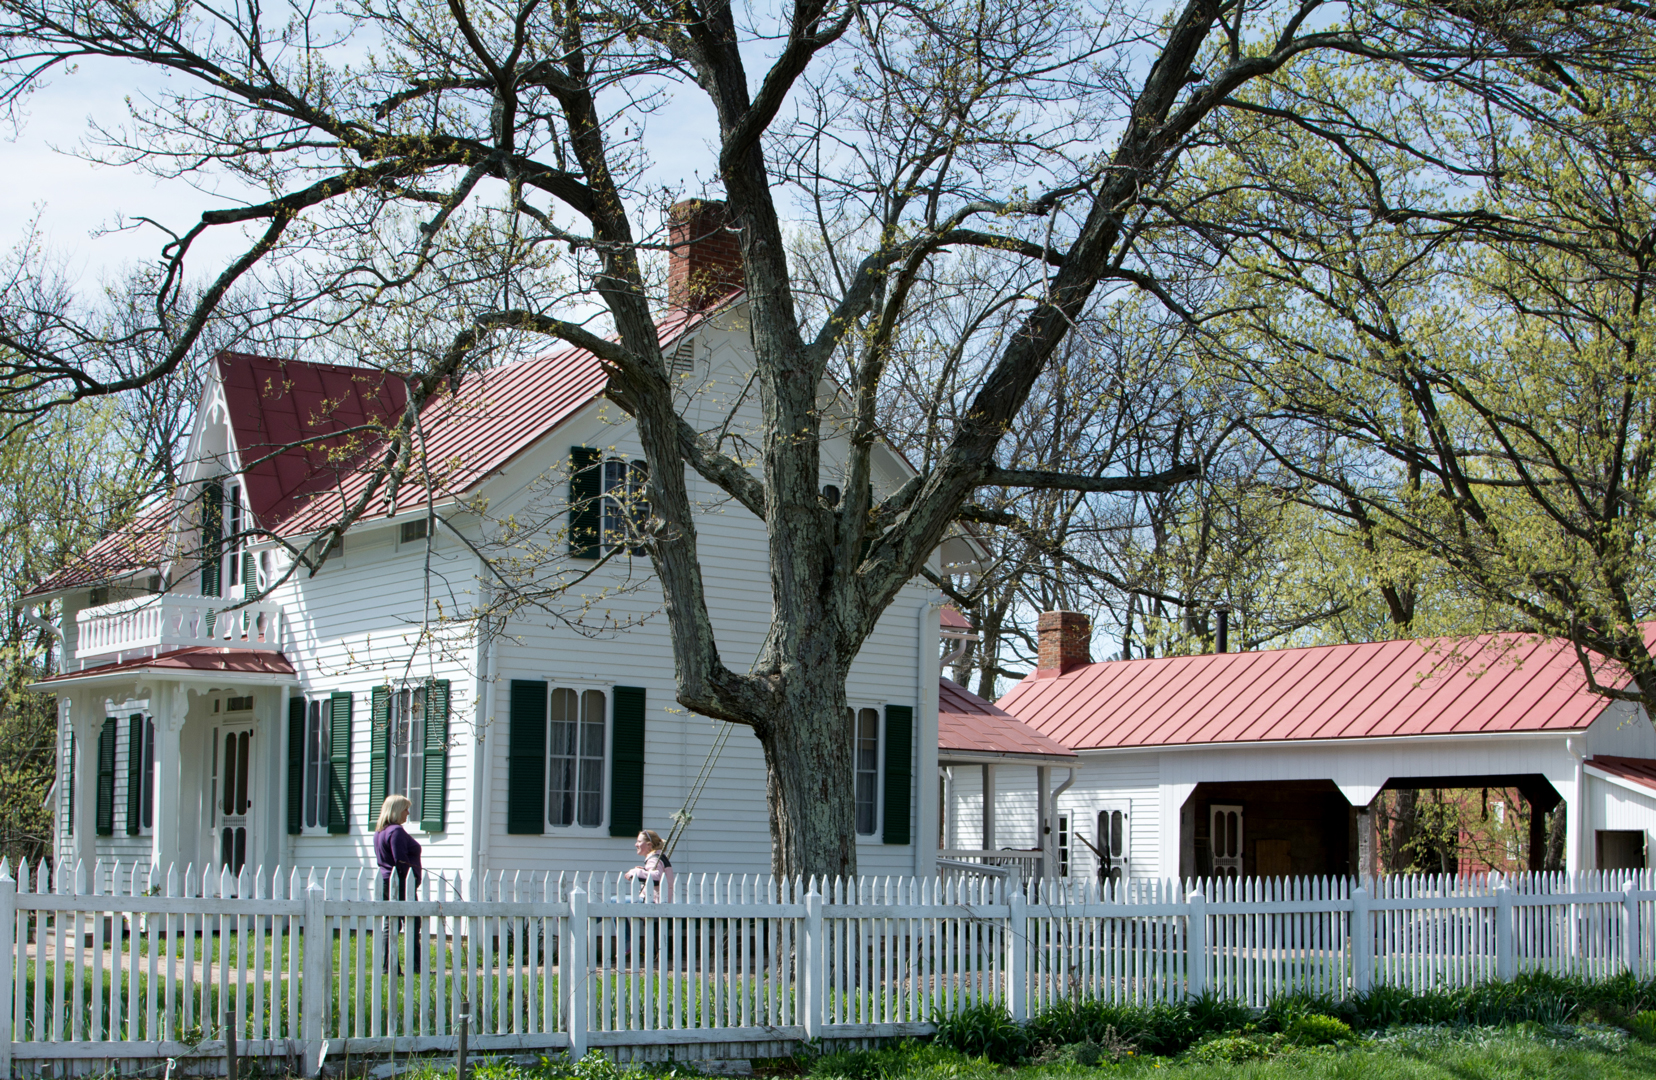 Farmhouse at Slate Run Living Historical Farm, with a girl on the swing